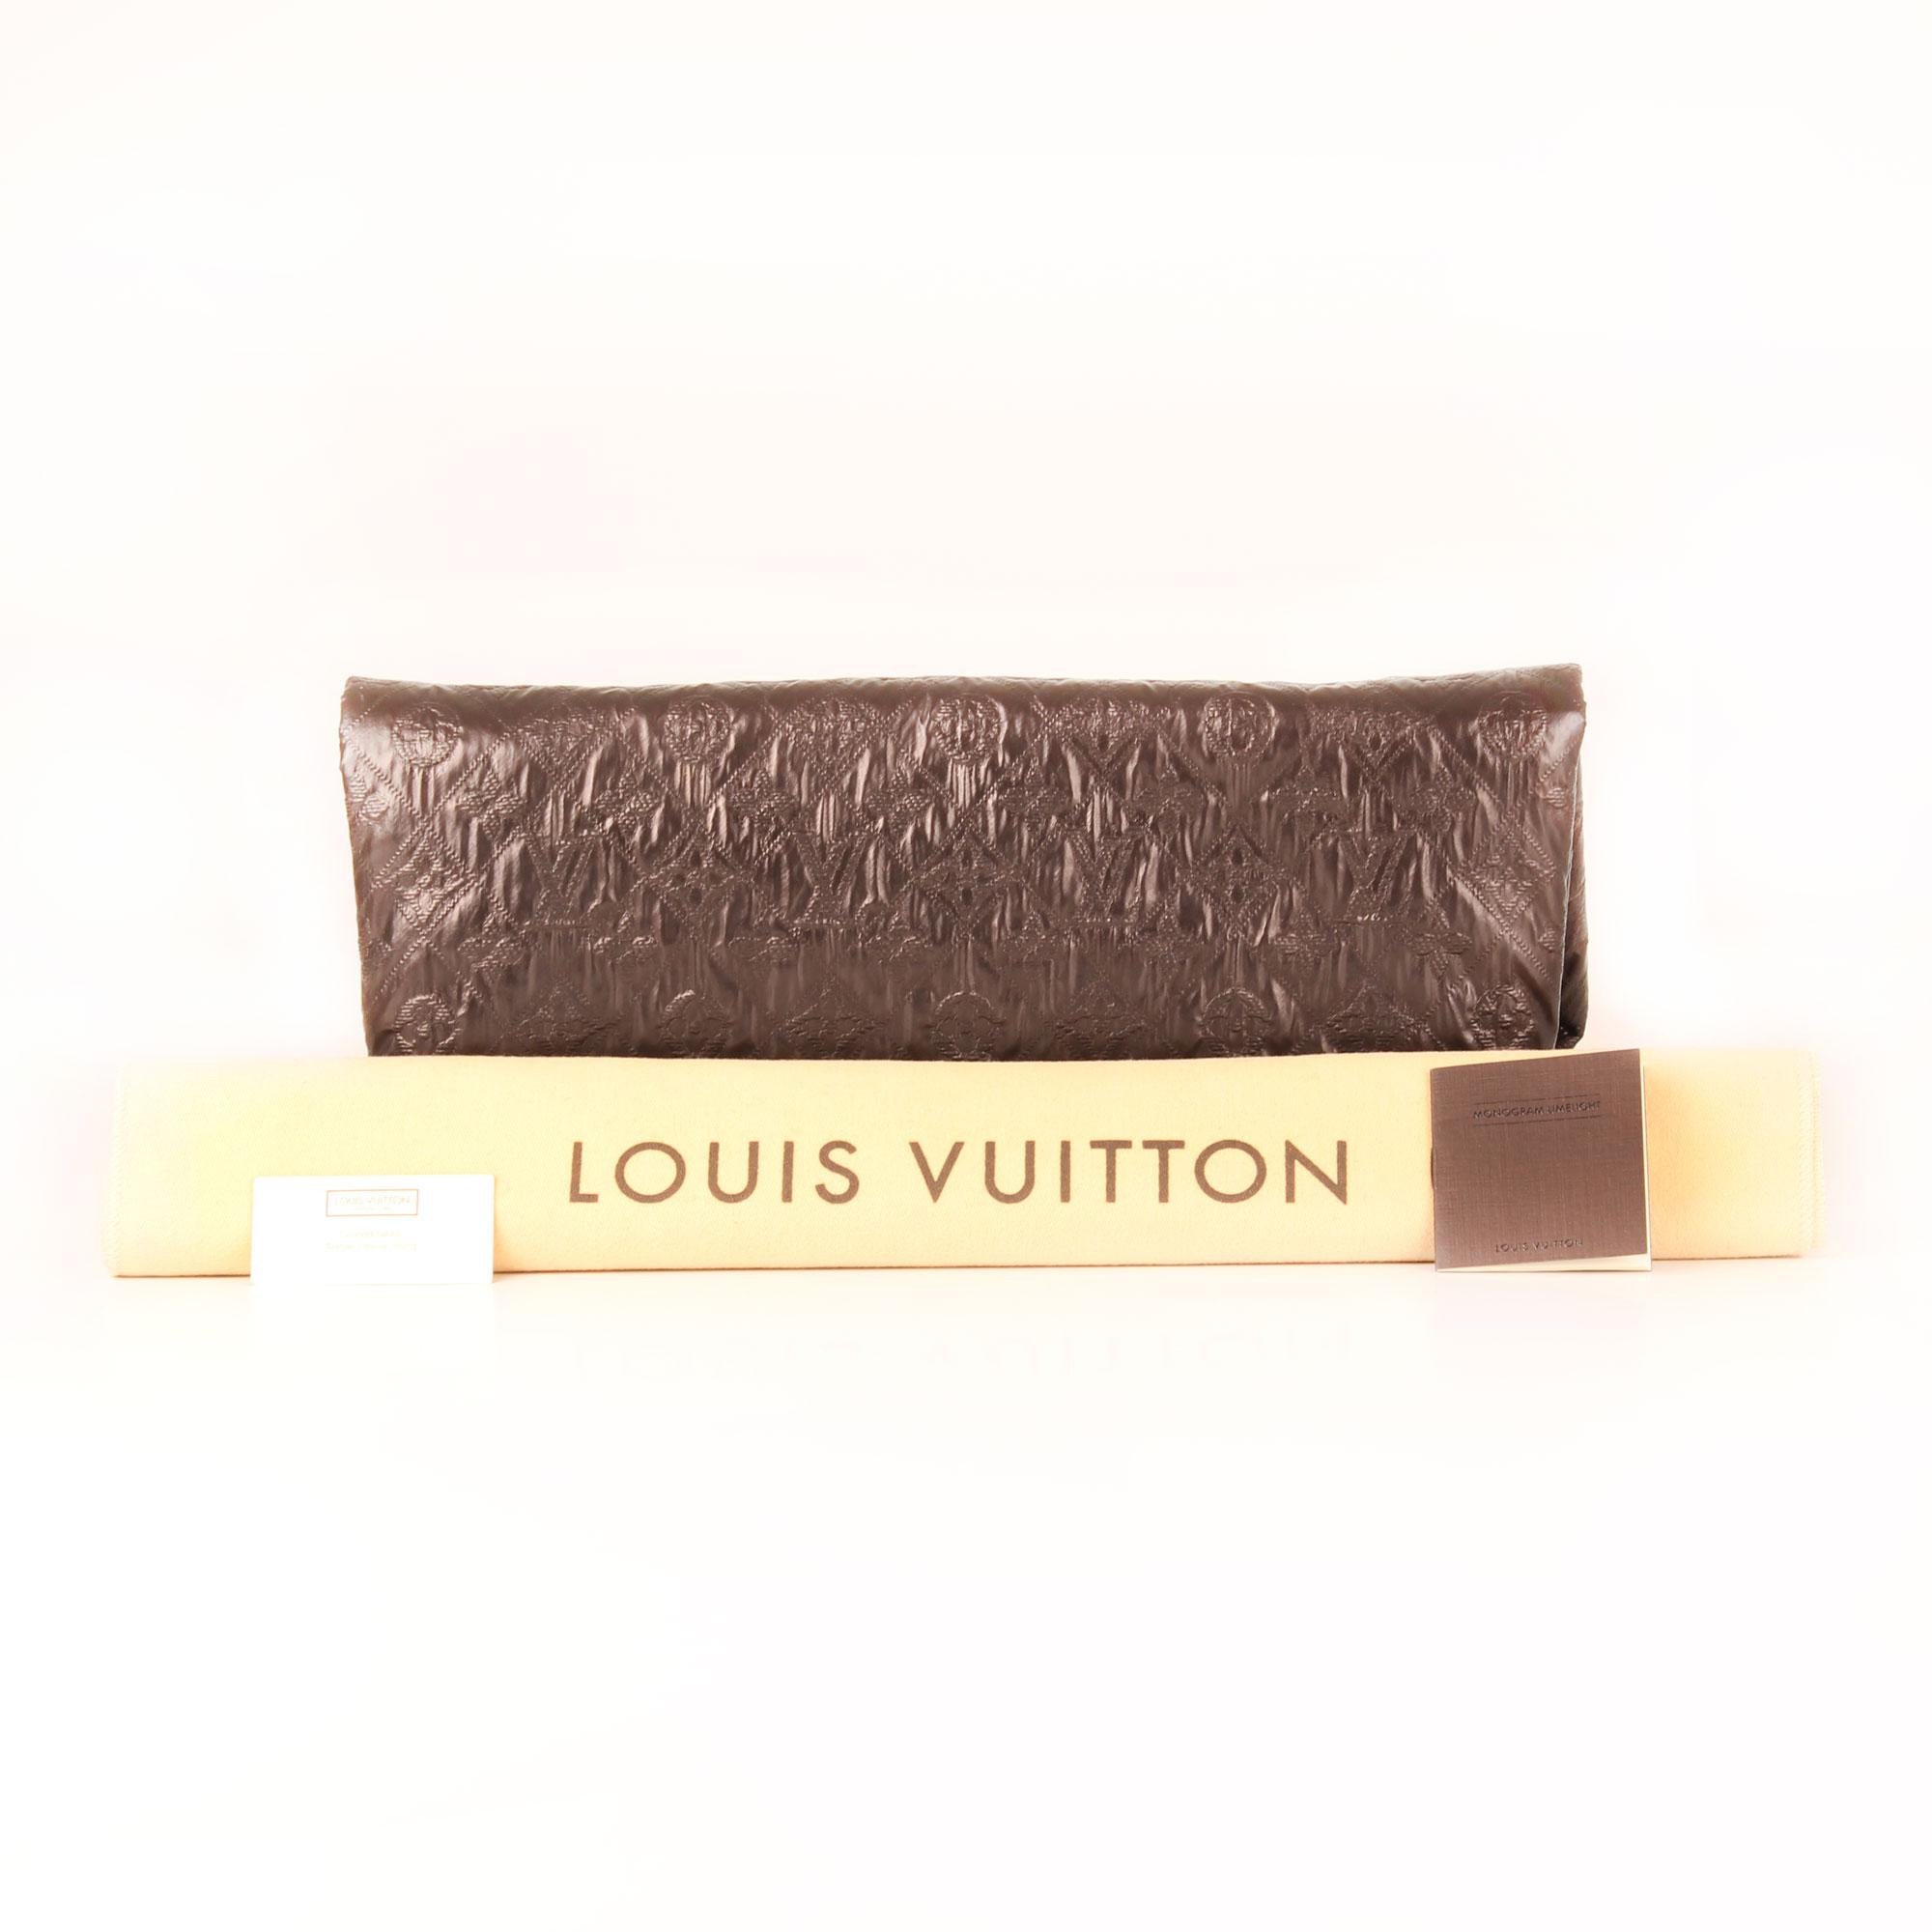 deb728cf2b3a Louis Vuitton Clutch Limelight GM in Metallic Black I CBL Bags